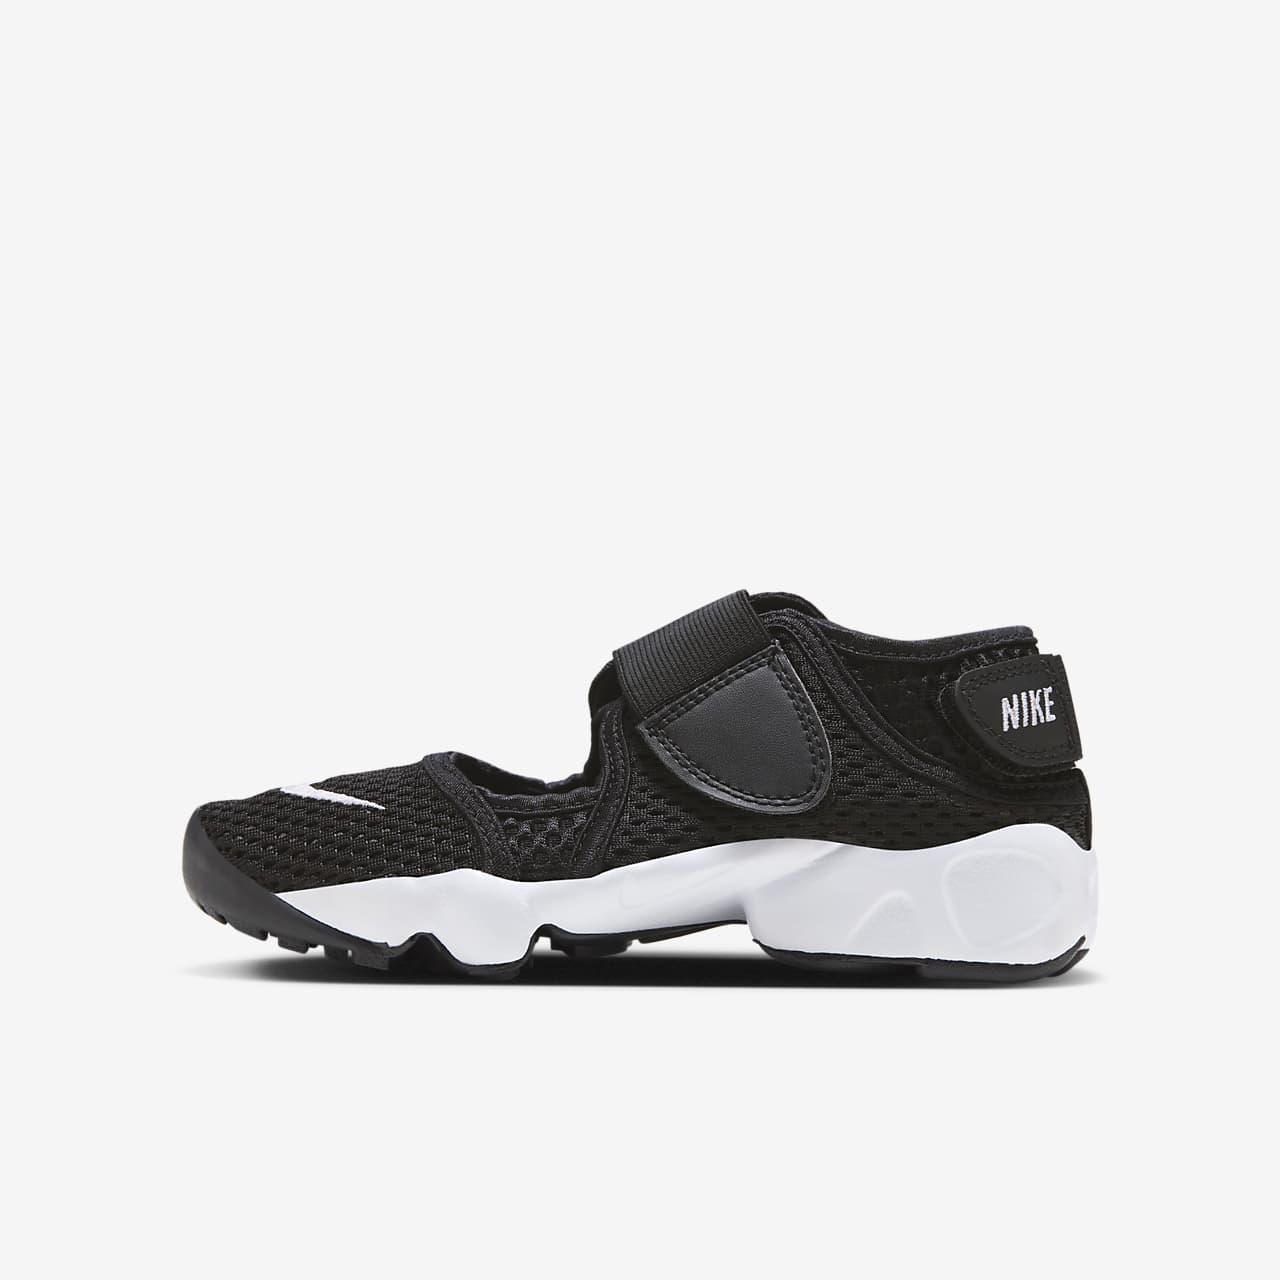 sports shoes 00d06 b3988 greece nike air rift zapatillas niños de preescolar 105 c a 3 años 8f968  76736